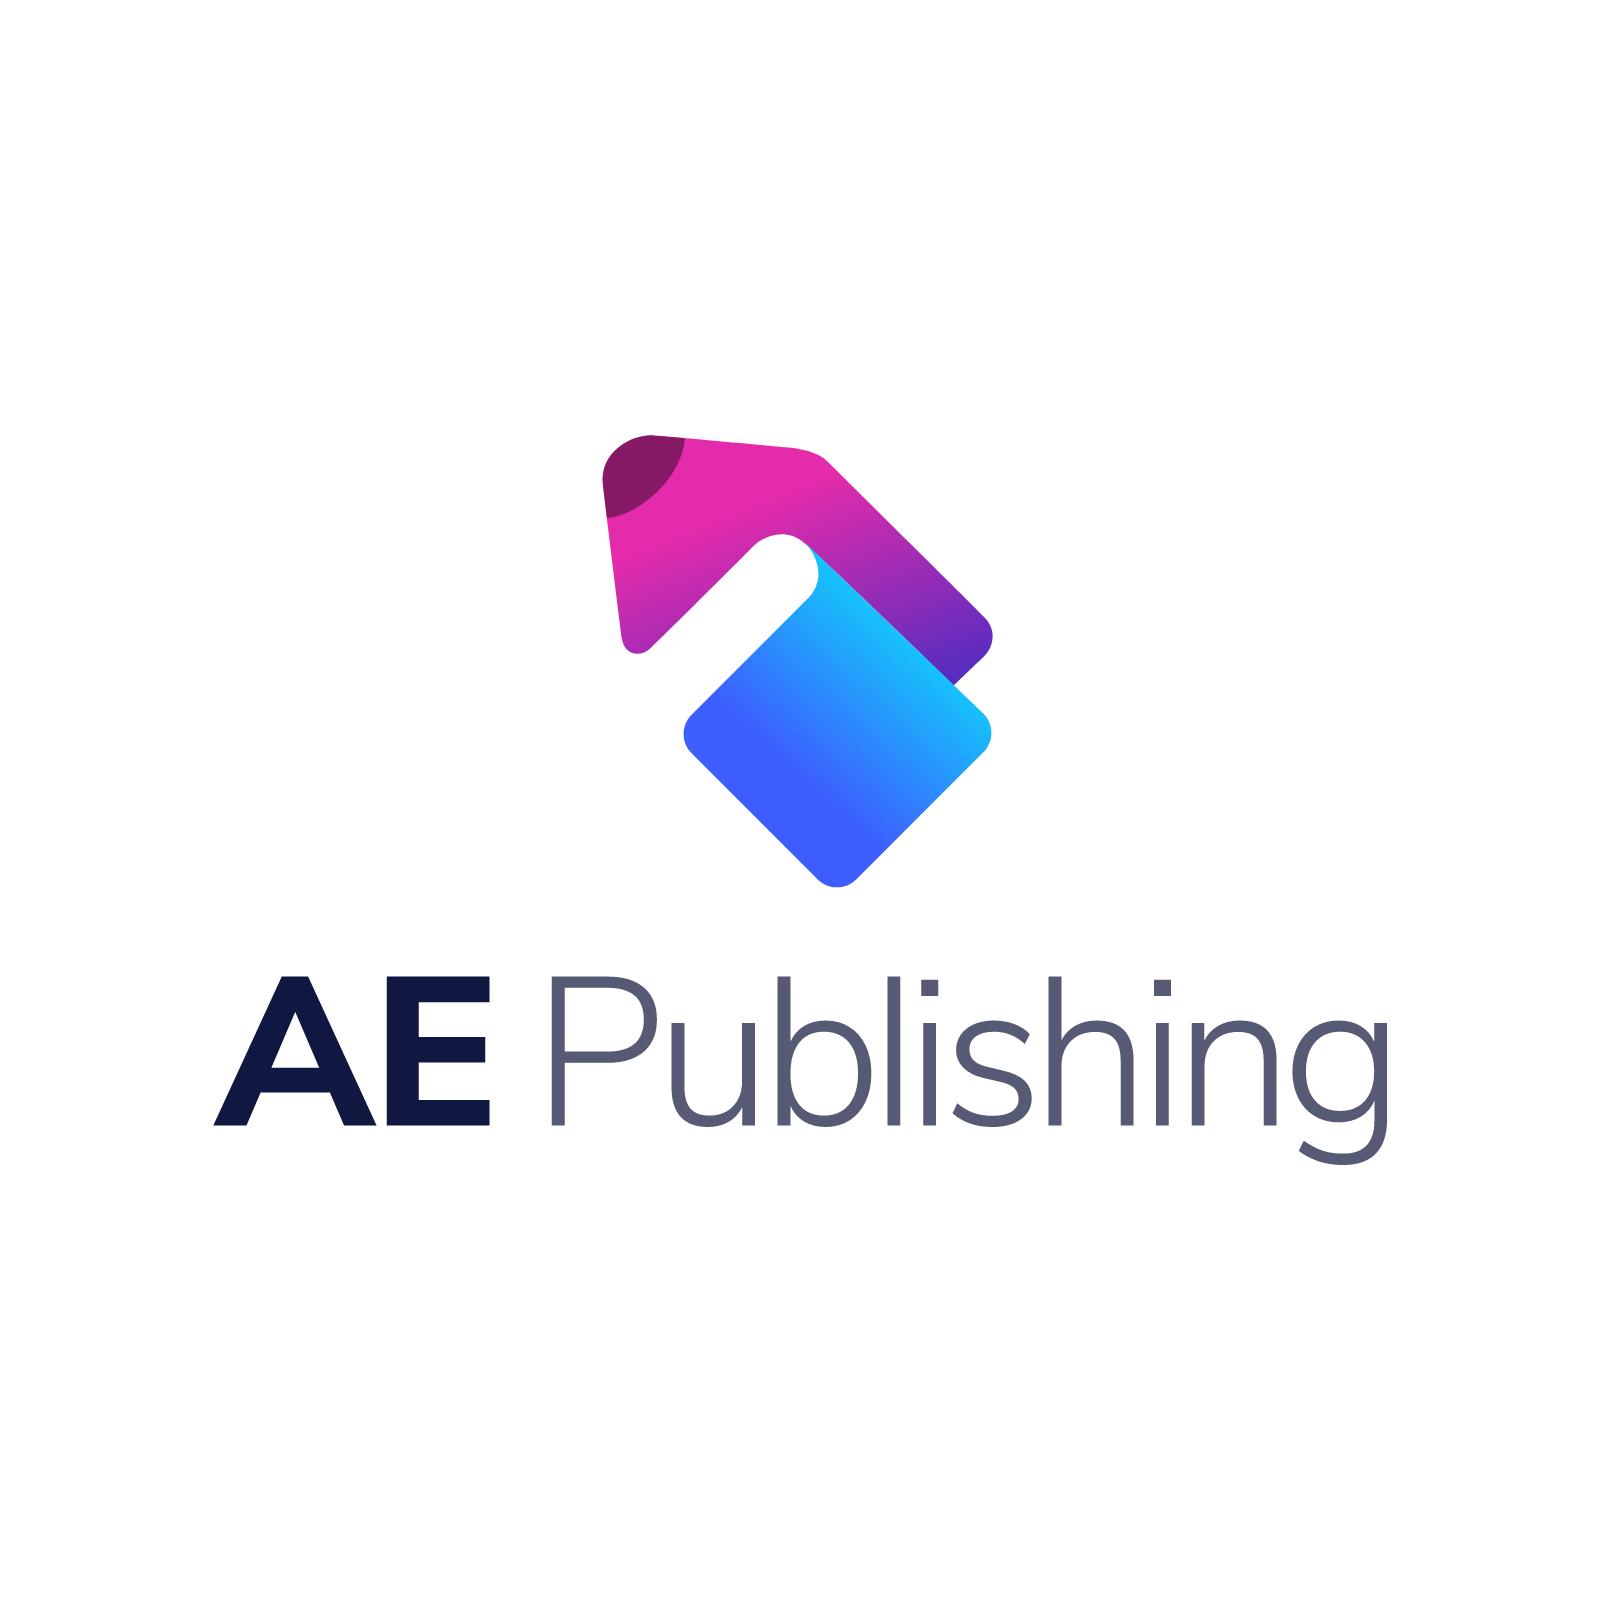 AE Publishing